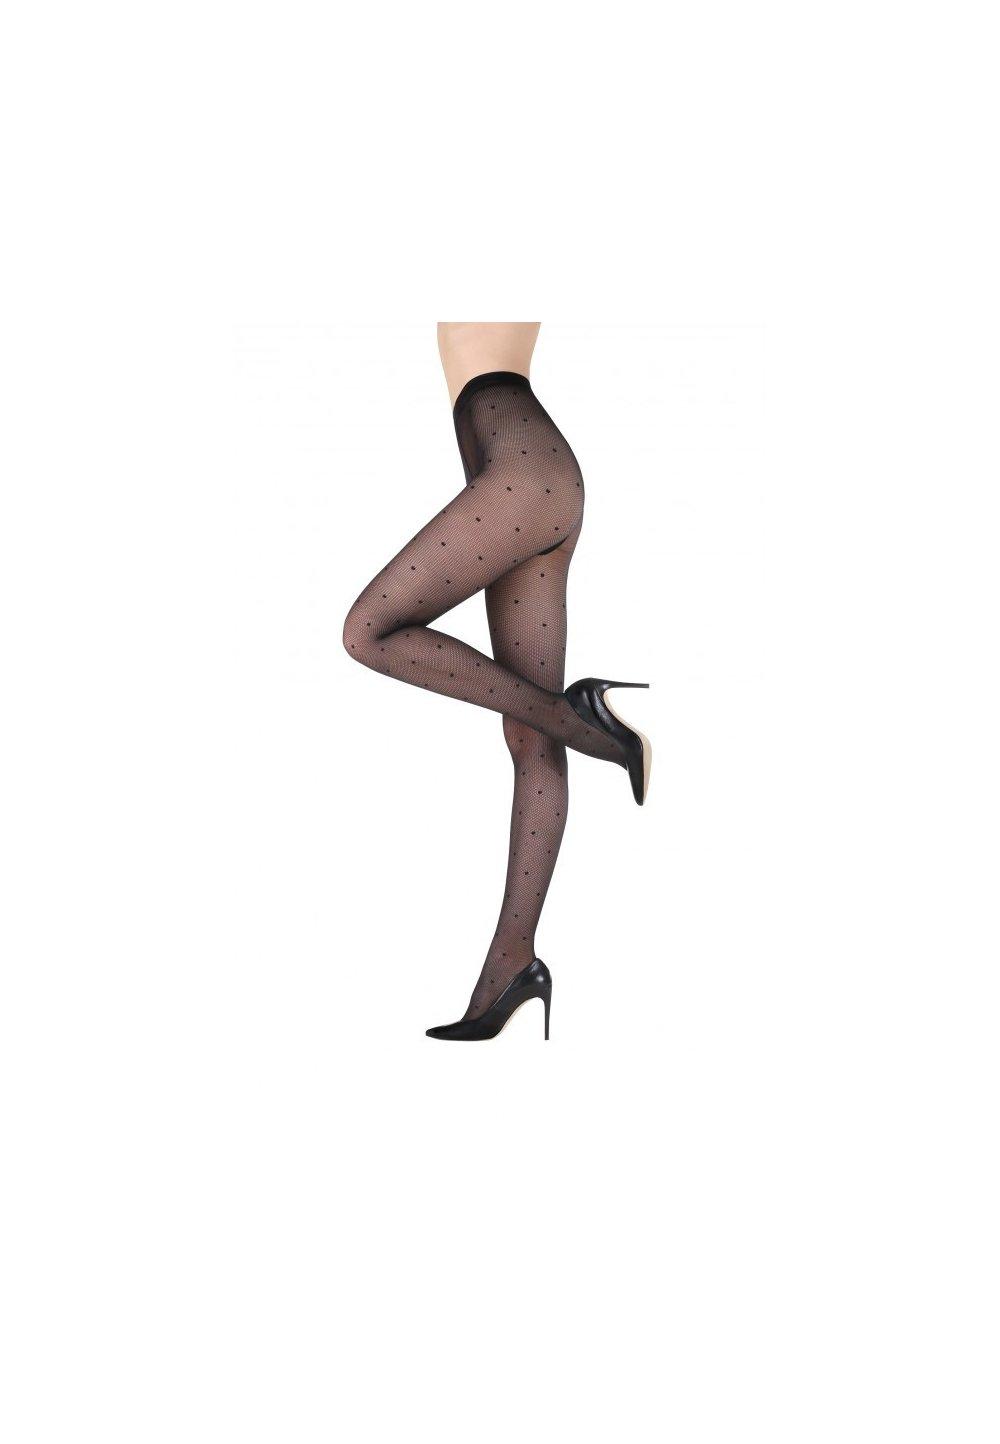 Ciorapi cu chilot, Funny, 20 Den, negri imagine